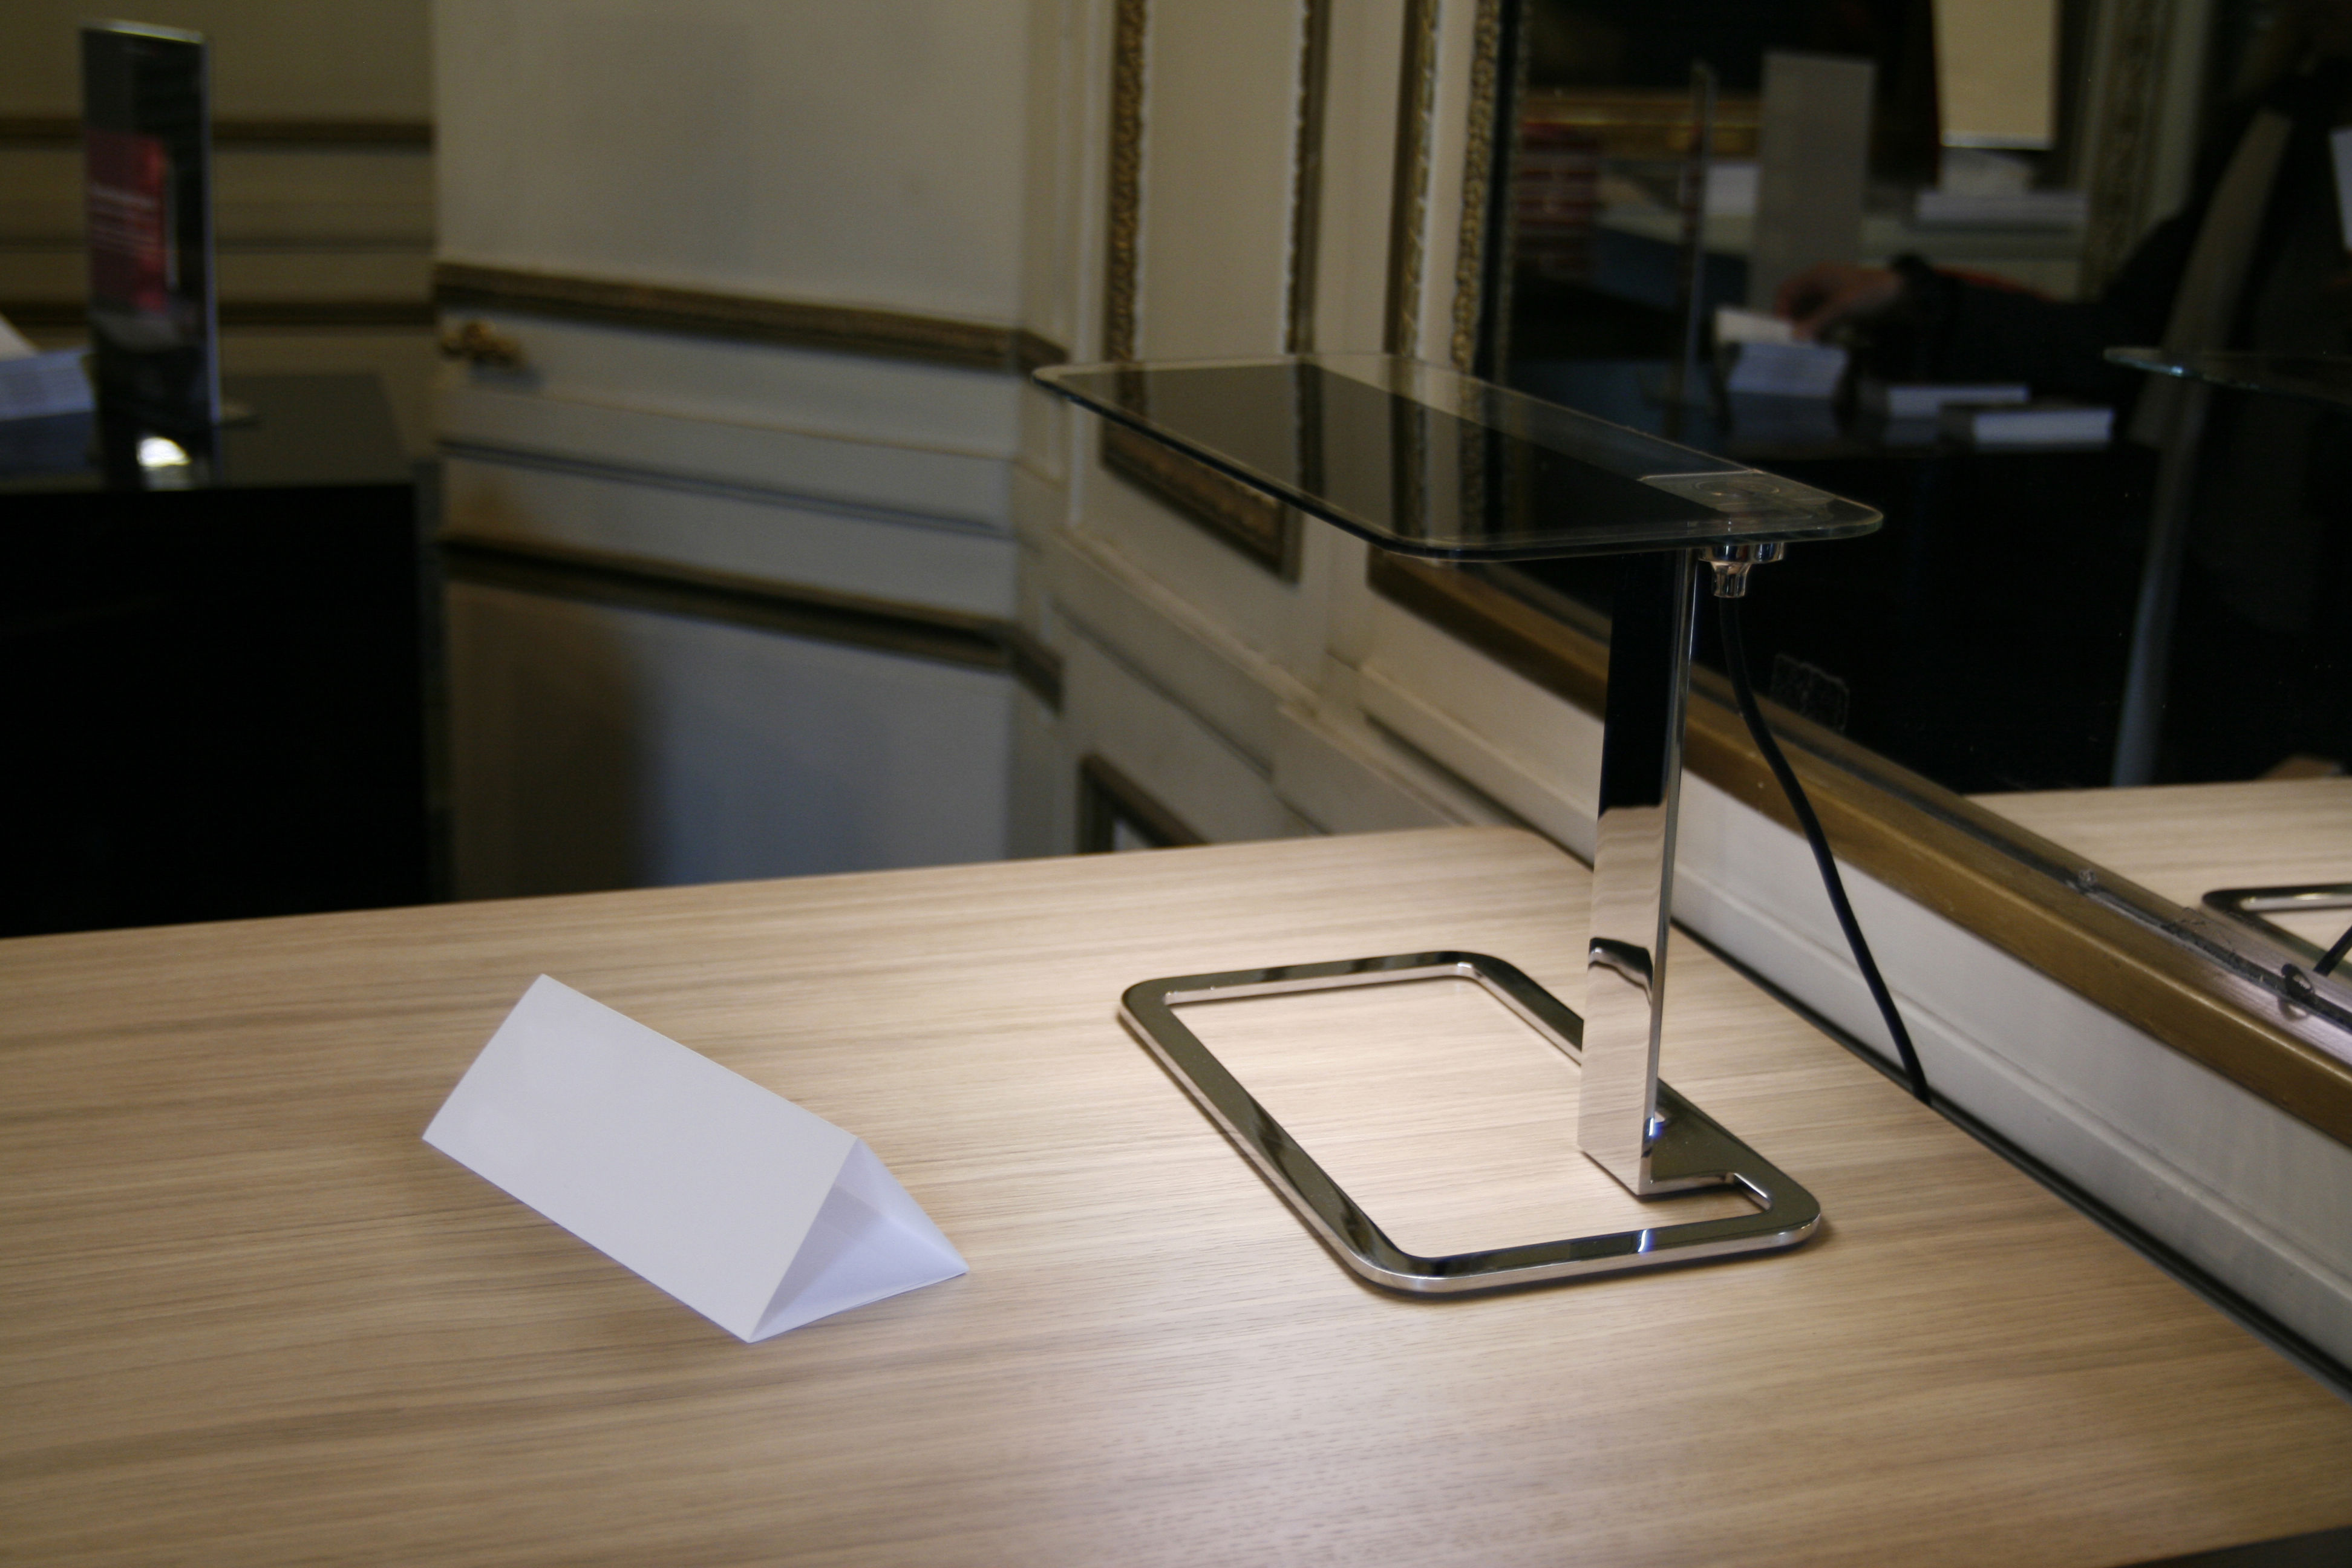 Olé lampada da tavolo tecnologia oled by blackbody cromato by